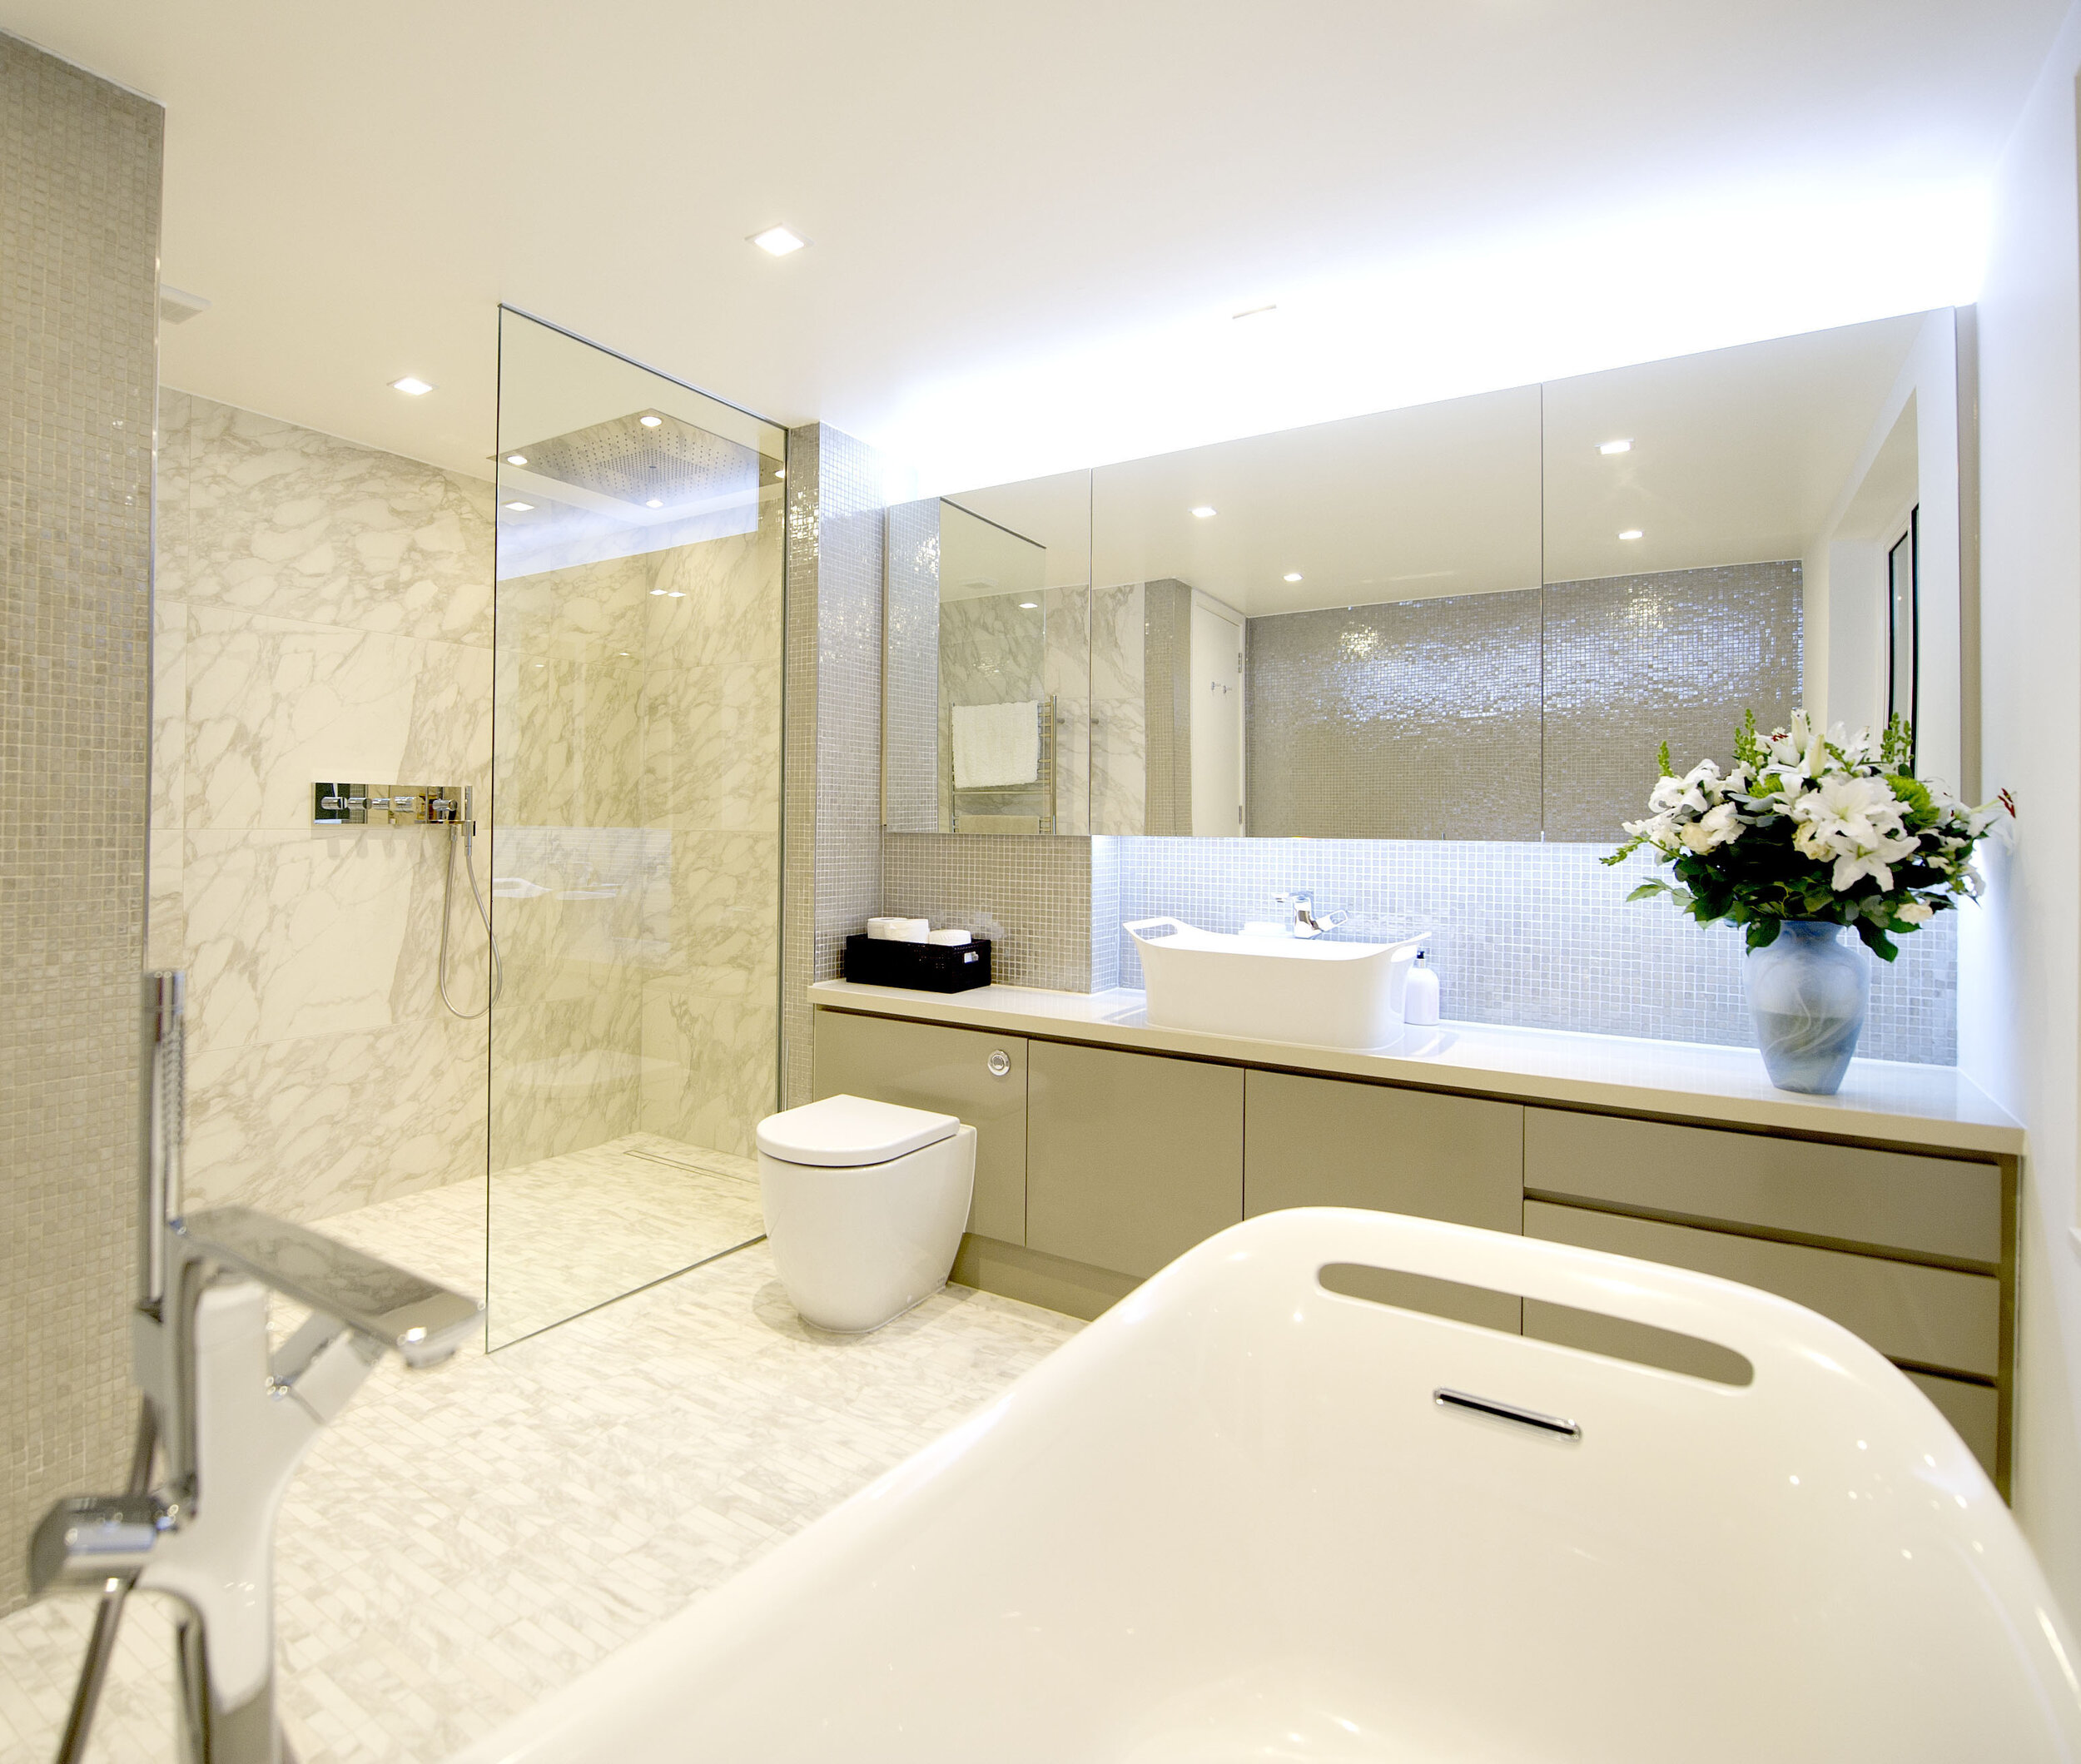 Main Bathroom edit.jpg